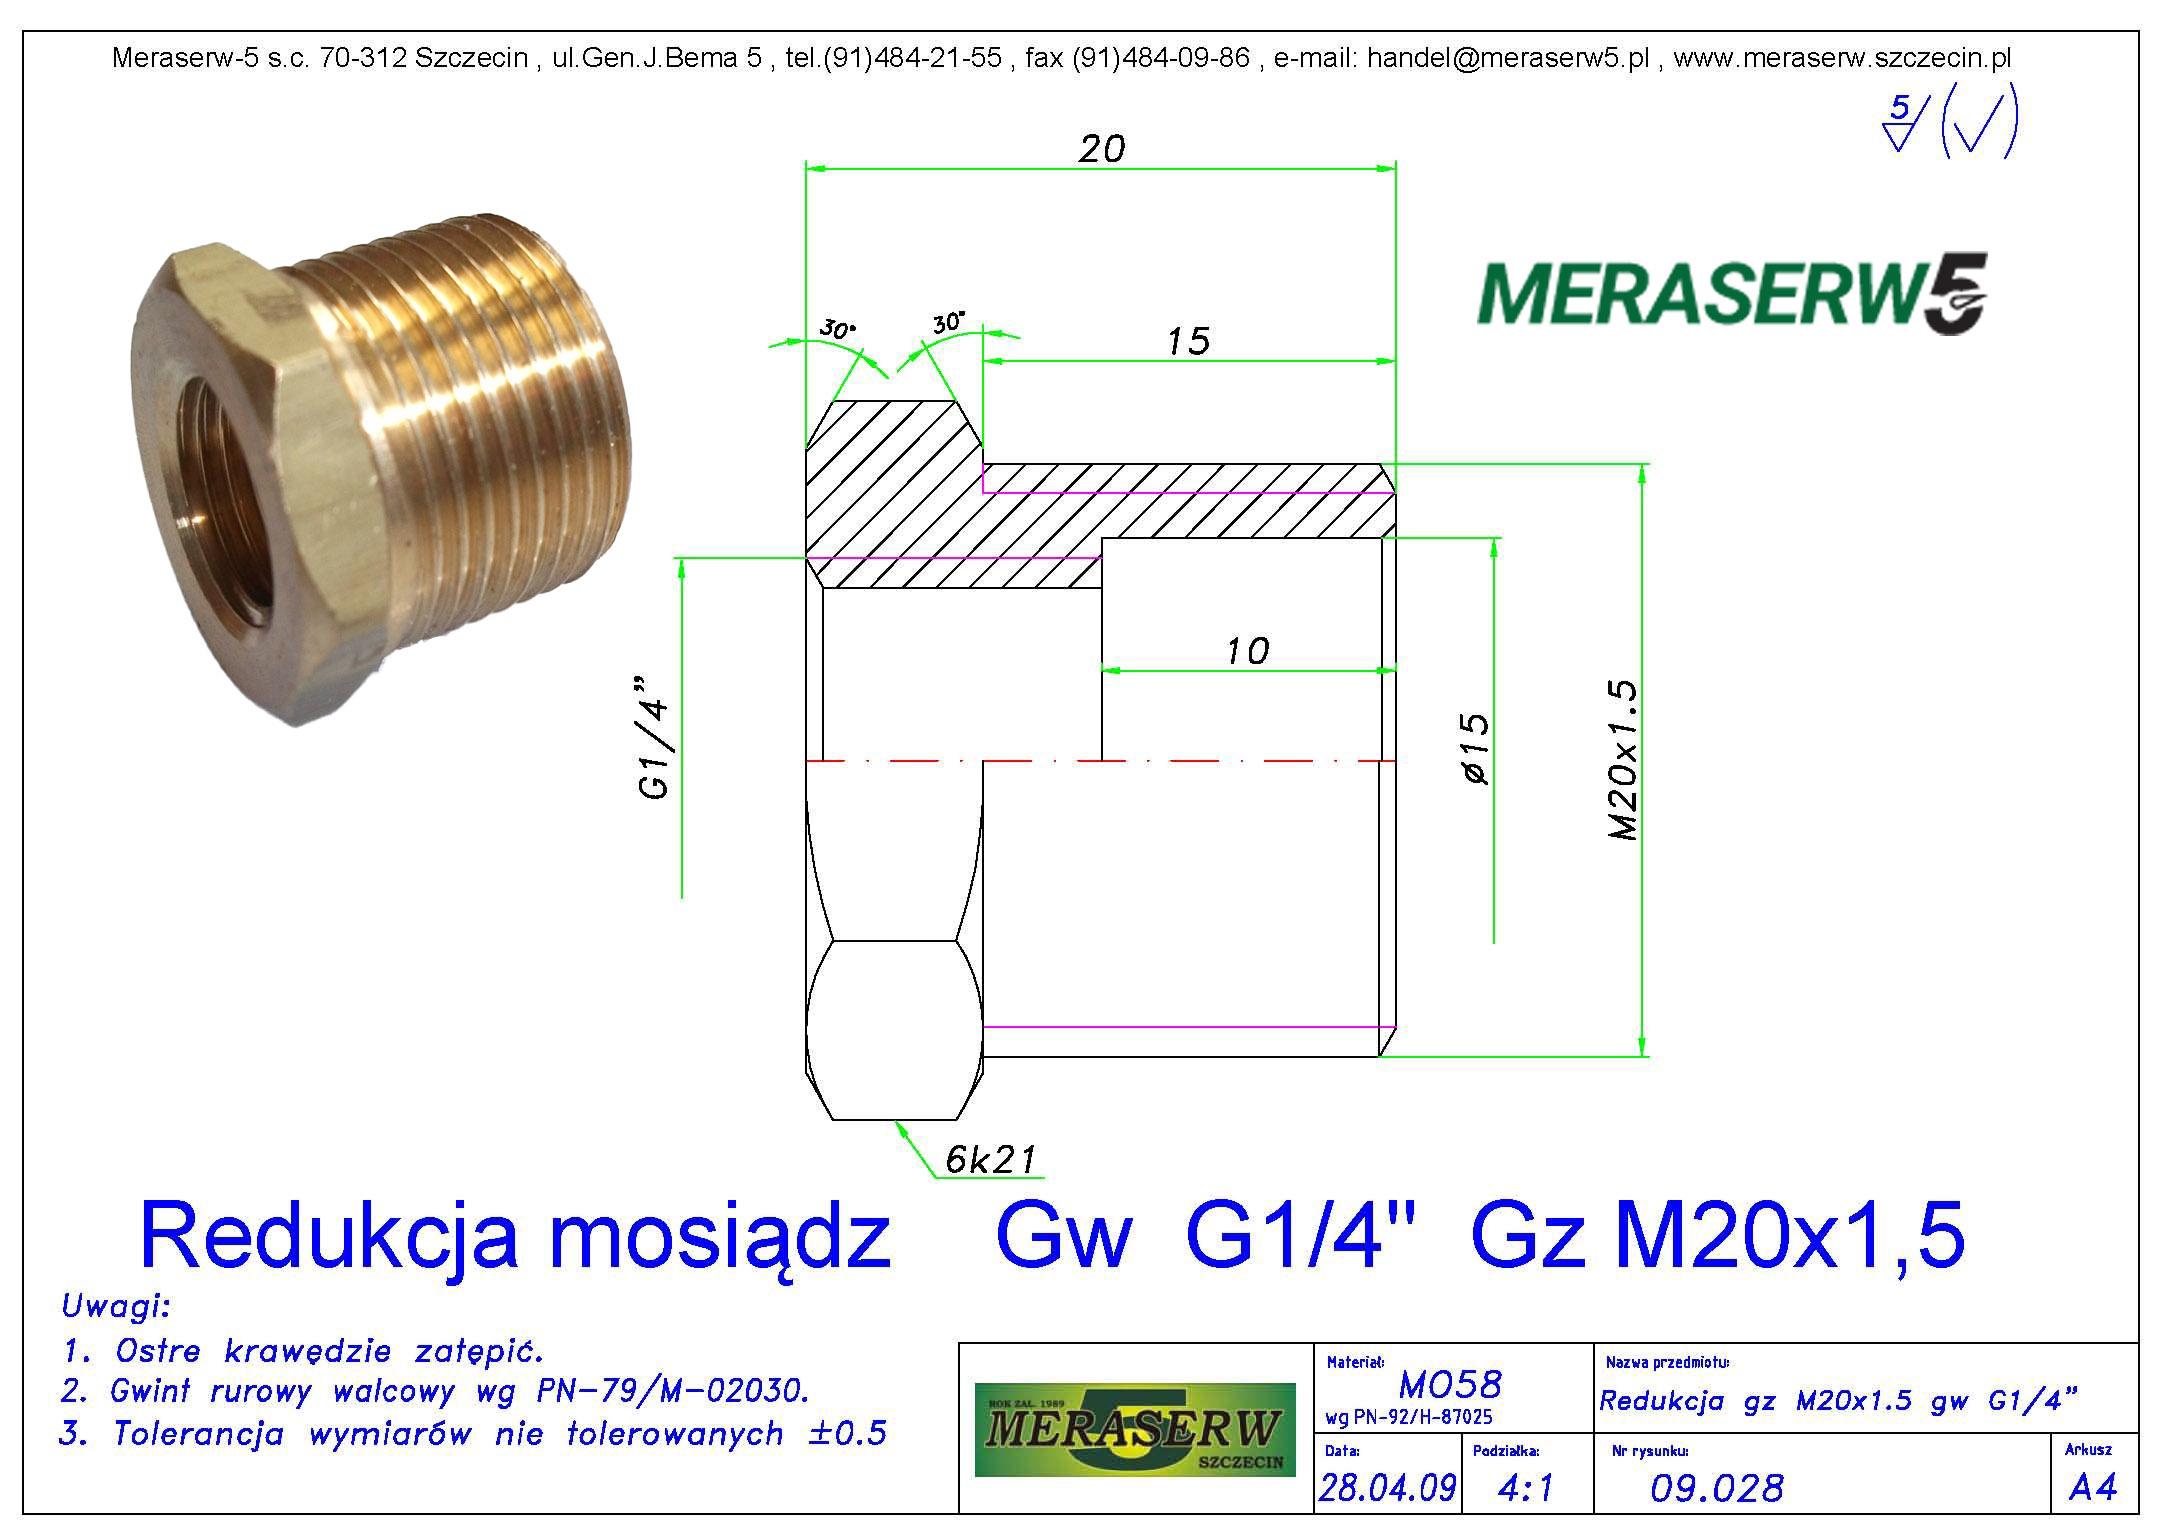 Gw 14 Gz M20